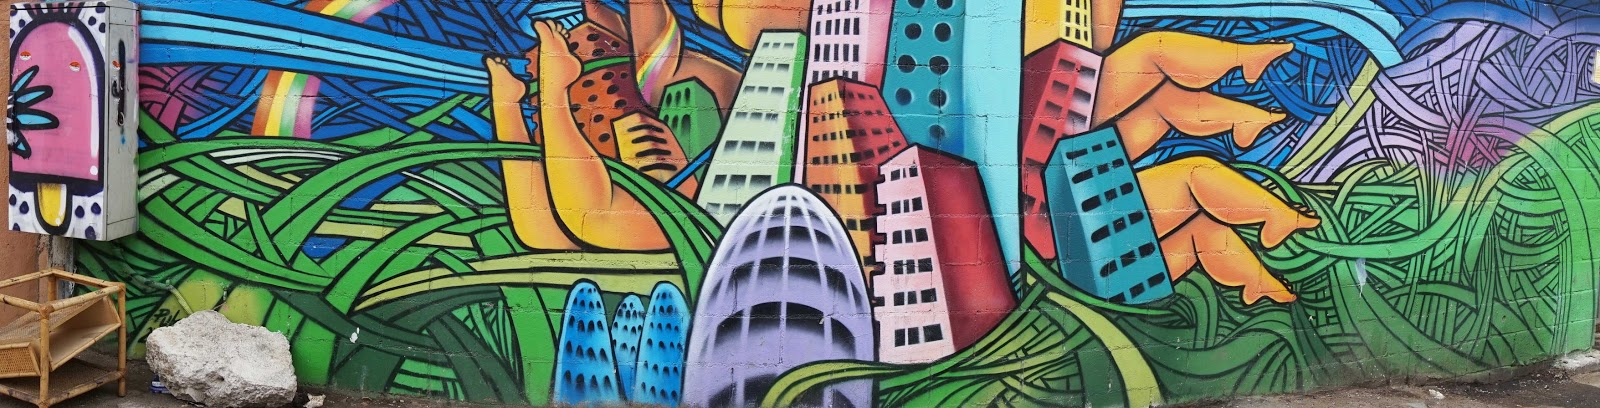 Barcelona City Graffiti